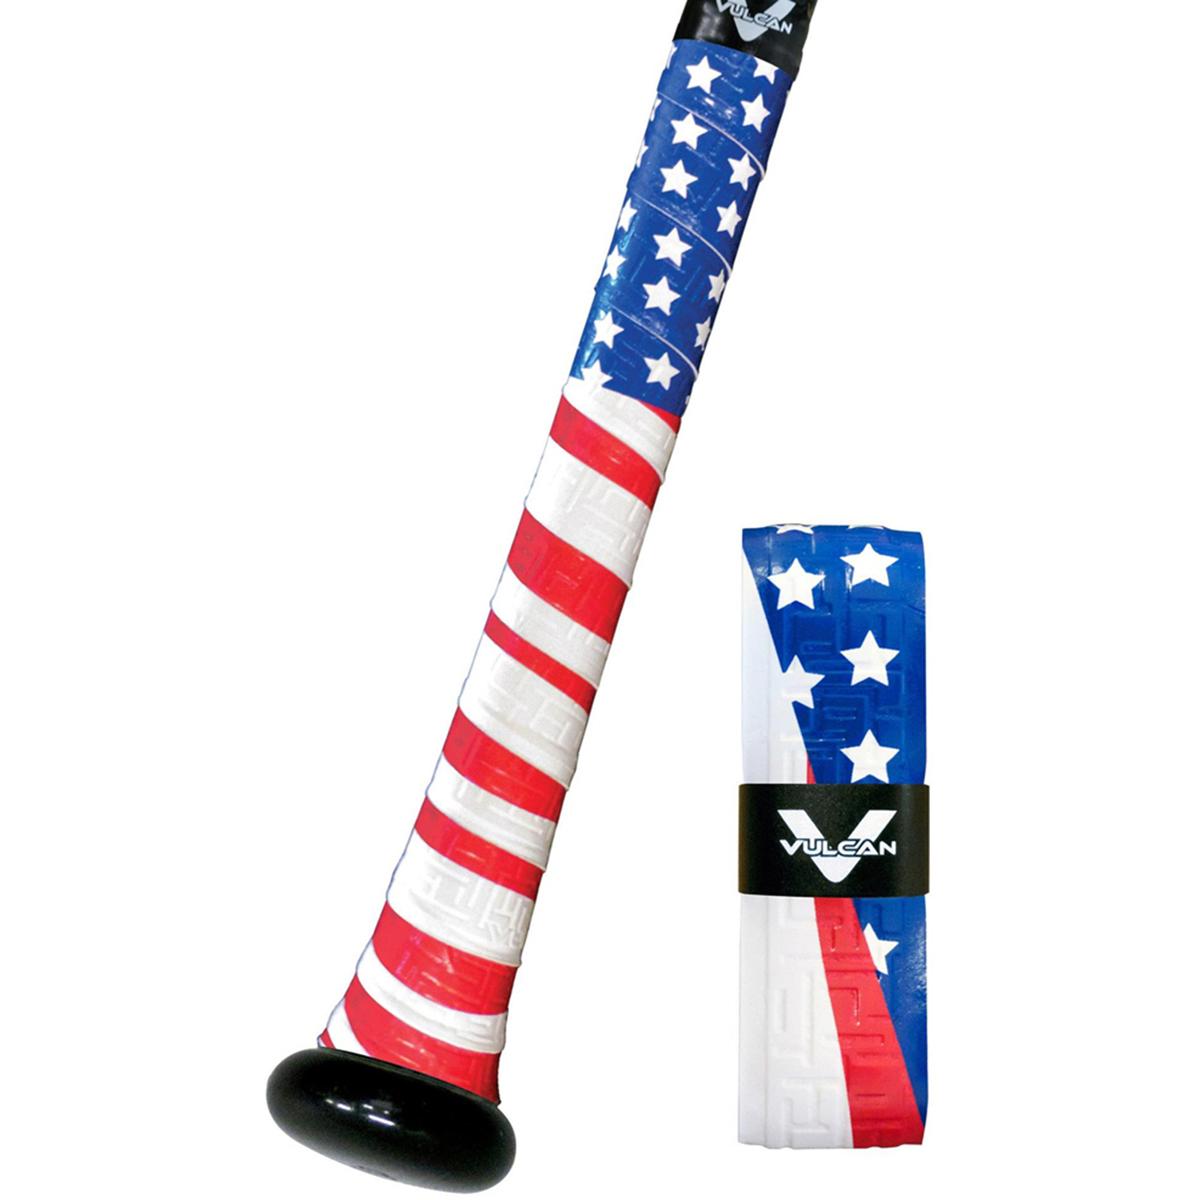 f4c54faeecdb Vulcan USA Series 1.75mm Ultralight Polymer Bat Grip Tape Wrap - Old Glory